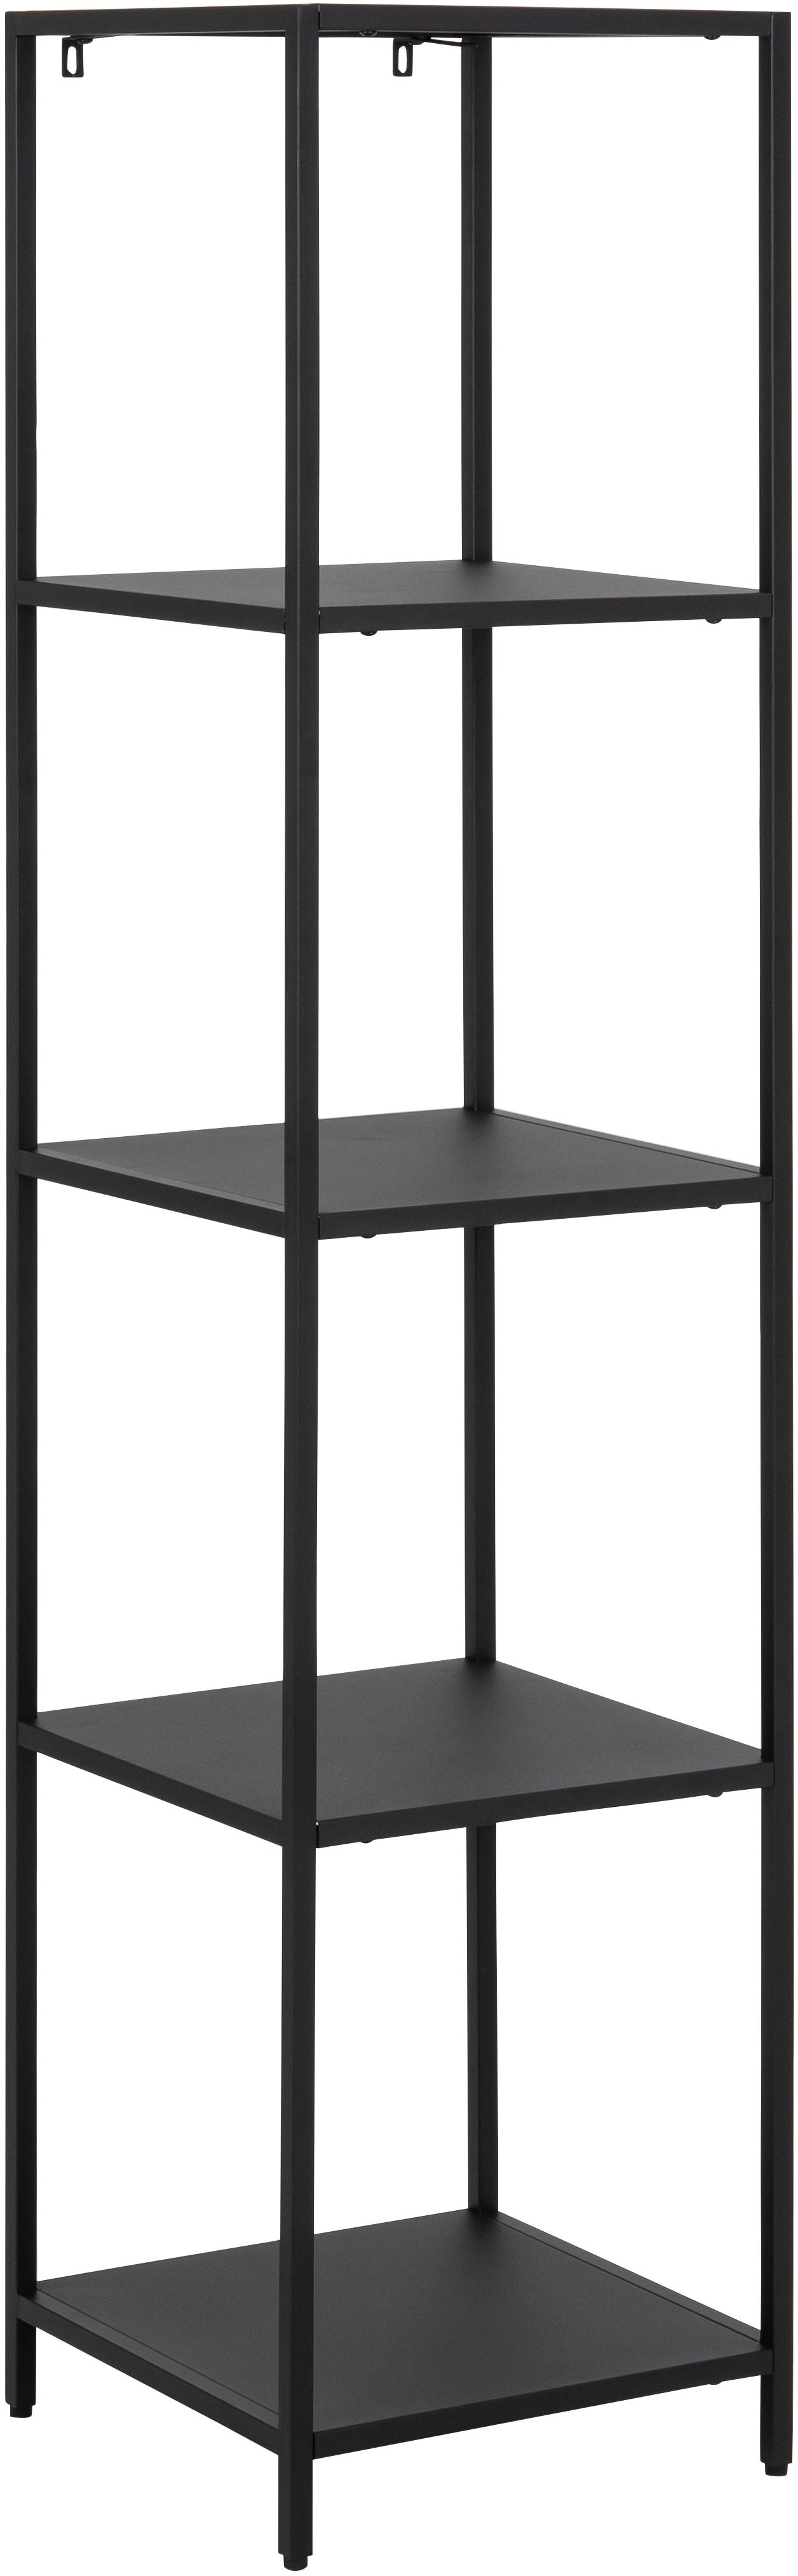 Estantería de metal Newton, Metal con pintura en polvo, Negro, An 35 x Al 146 cm